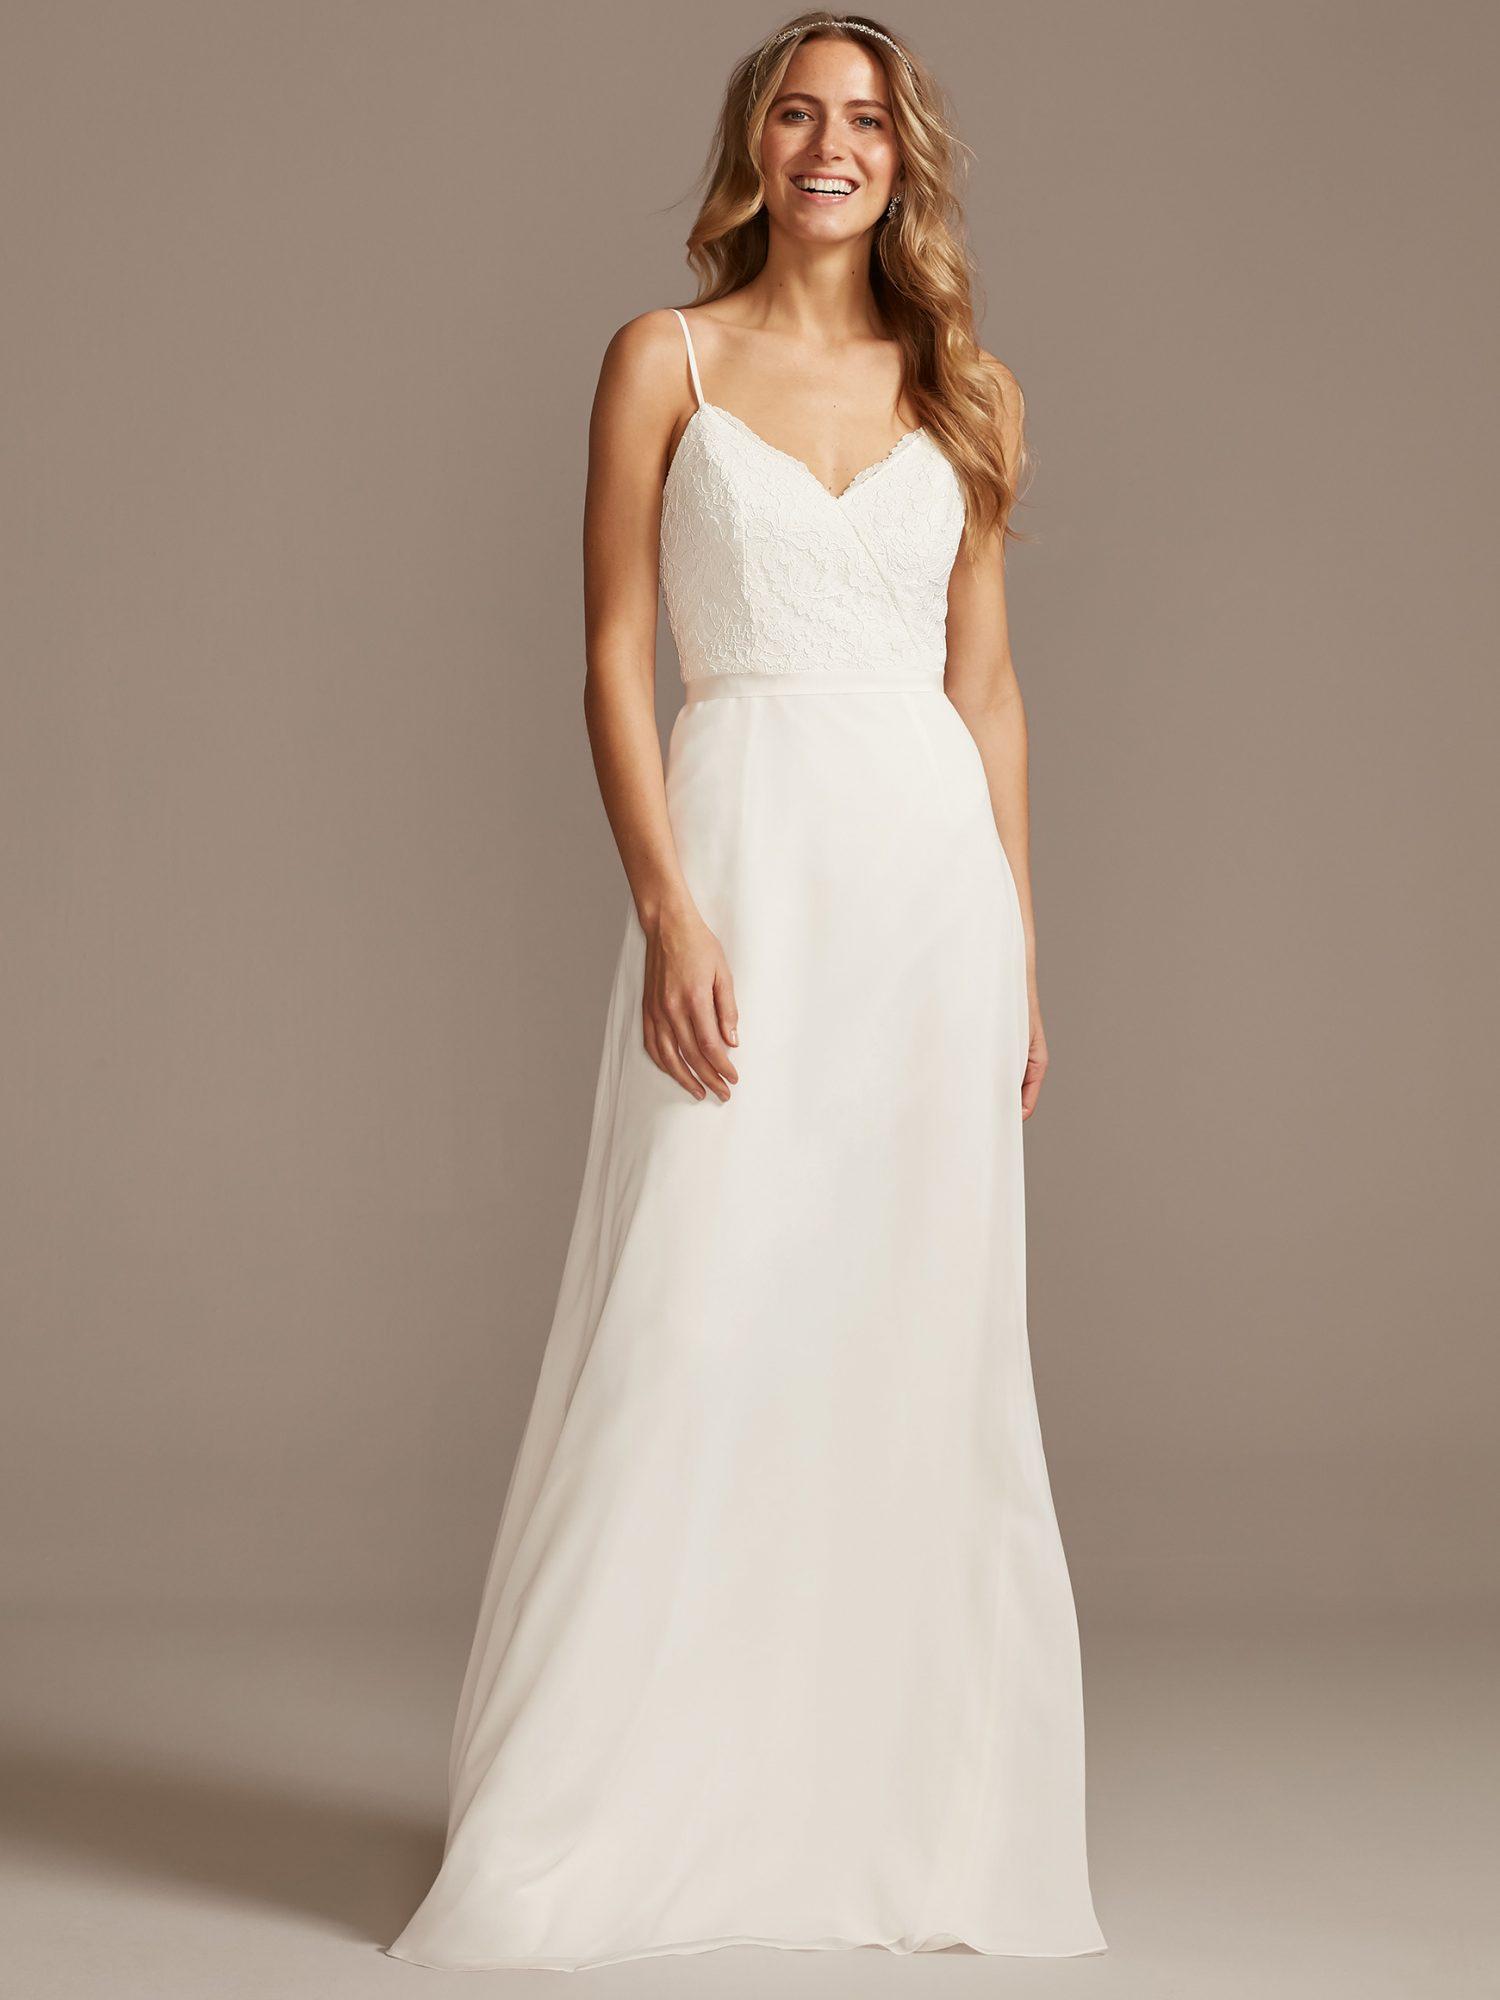 davids bridal thin strap v-neck a-line wedding dress spring 2021